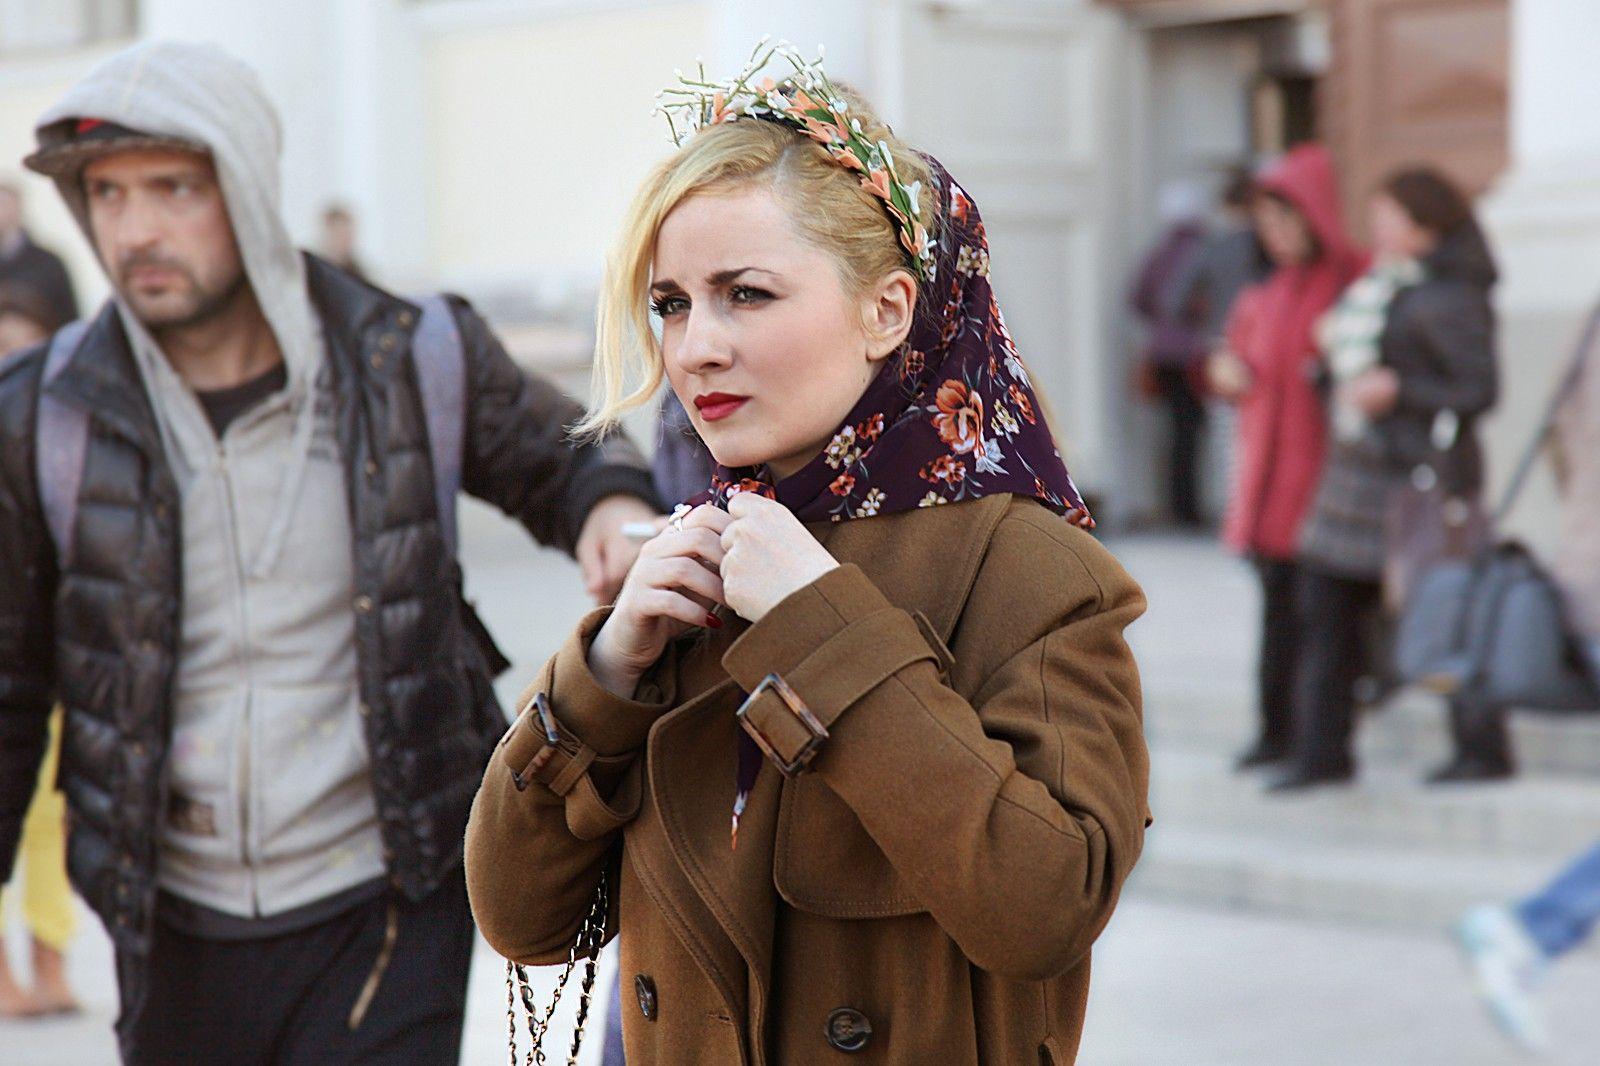 A kerchief and flower crown? Swoon. #refinery29 http://www.refinery29.com/russian-street-style#slide-11